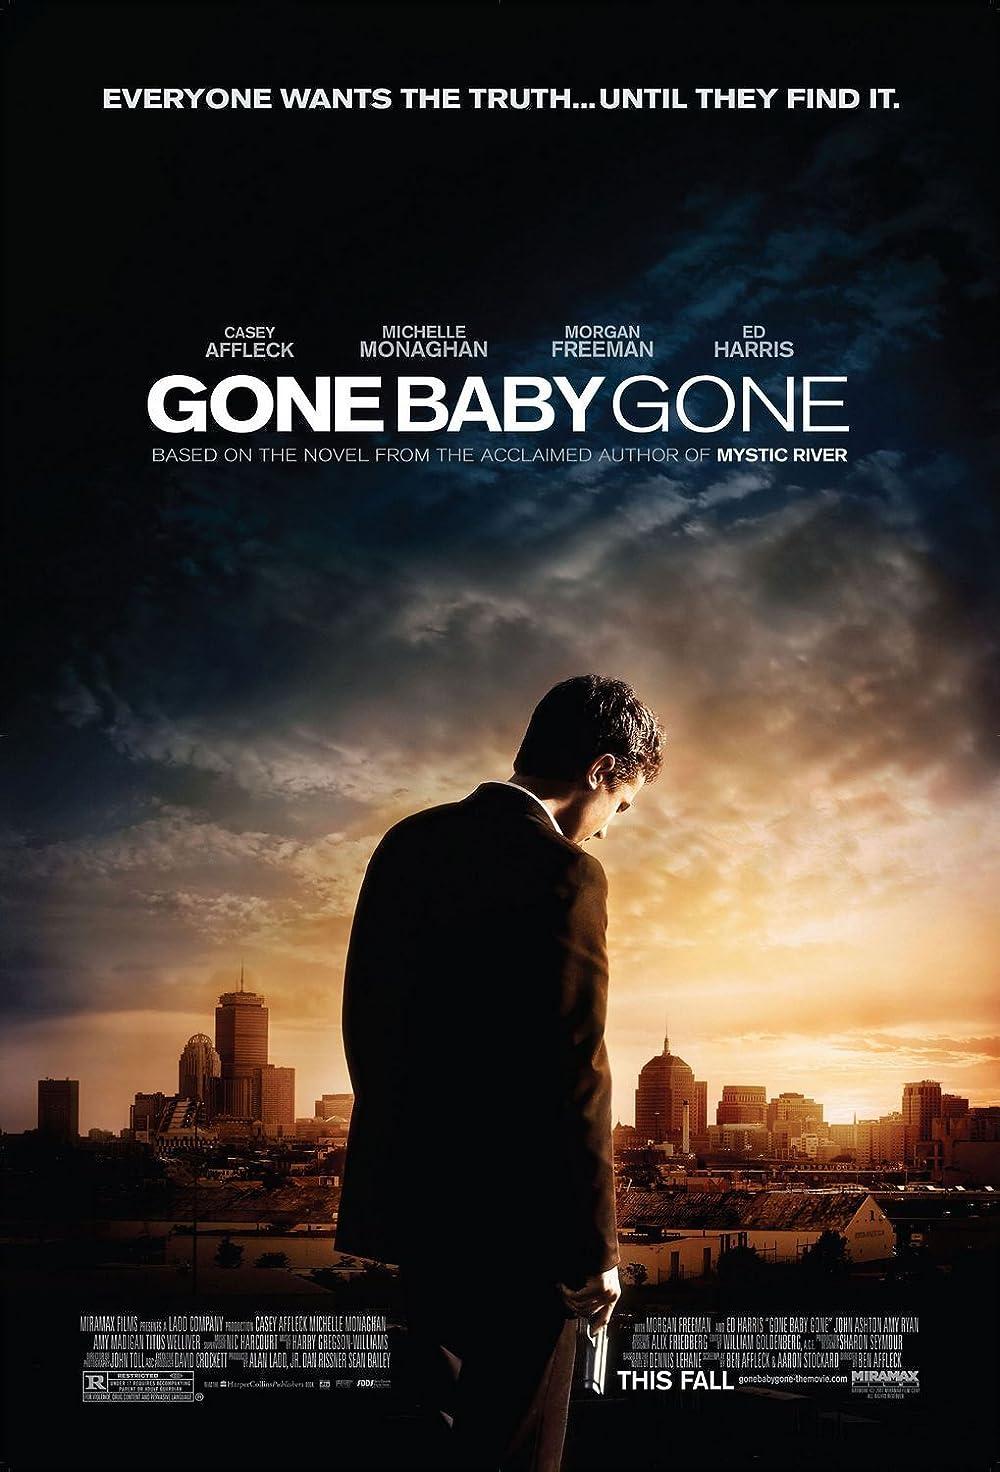 Gone Baby Gone 2007 Hindi ORG Dual Audio 480p NF HDRip MSub 400MB x264 AAC